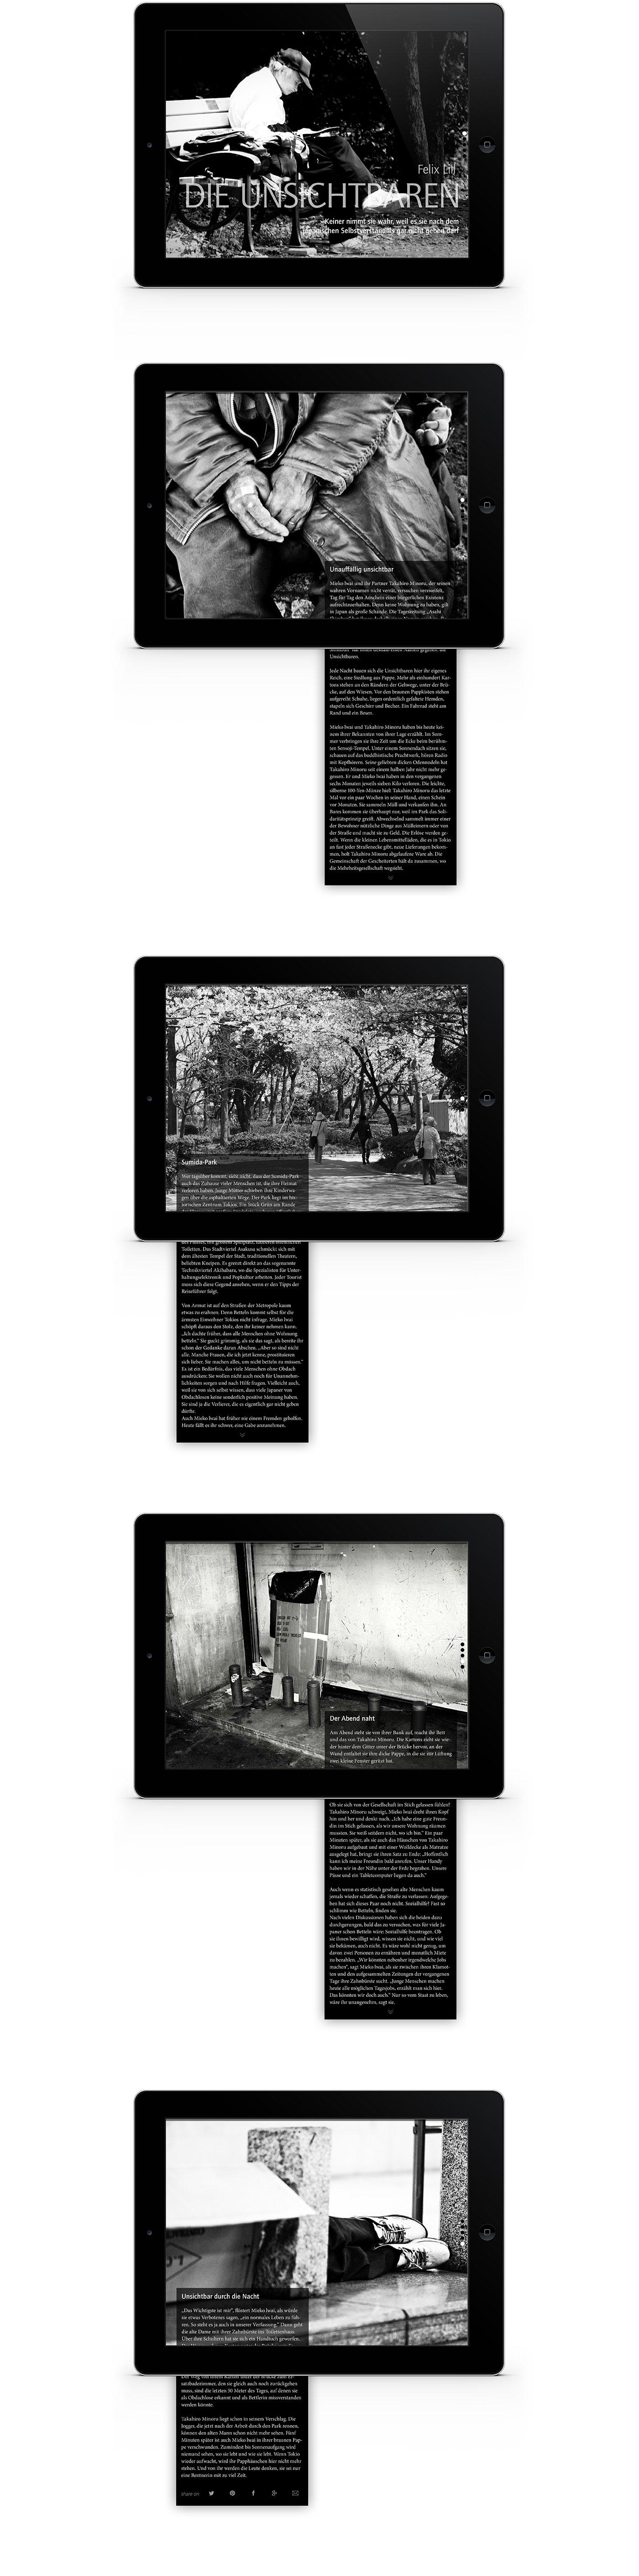 Layout interaktives iPad Magazin Reportage Taxi Tokio | Grafik Design Freelancer Berlin